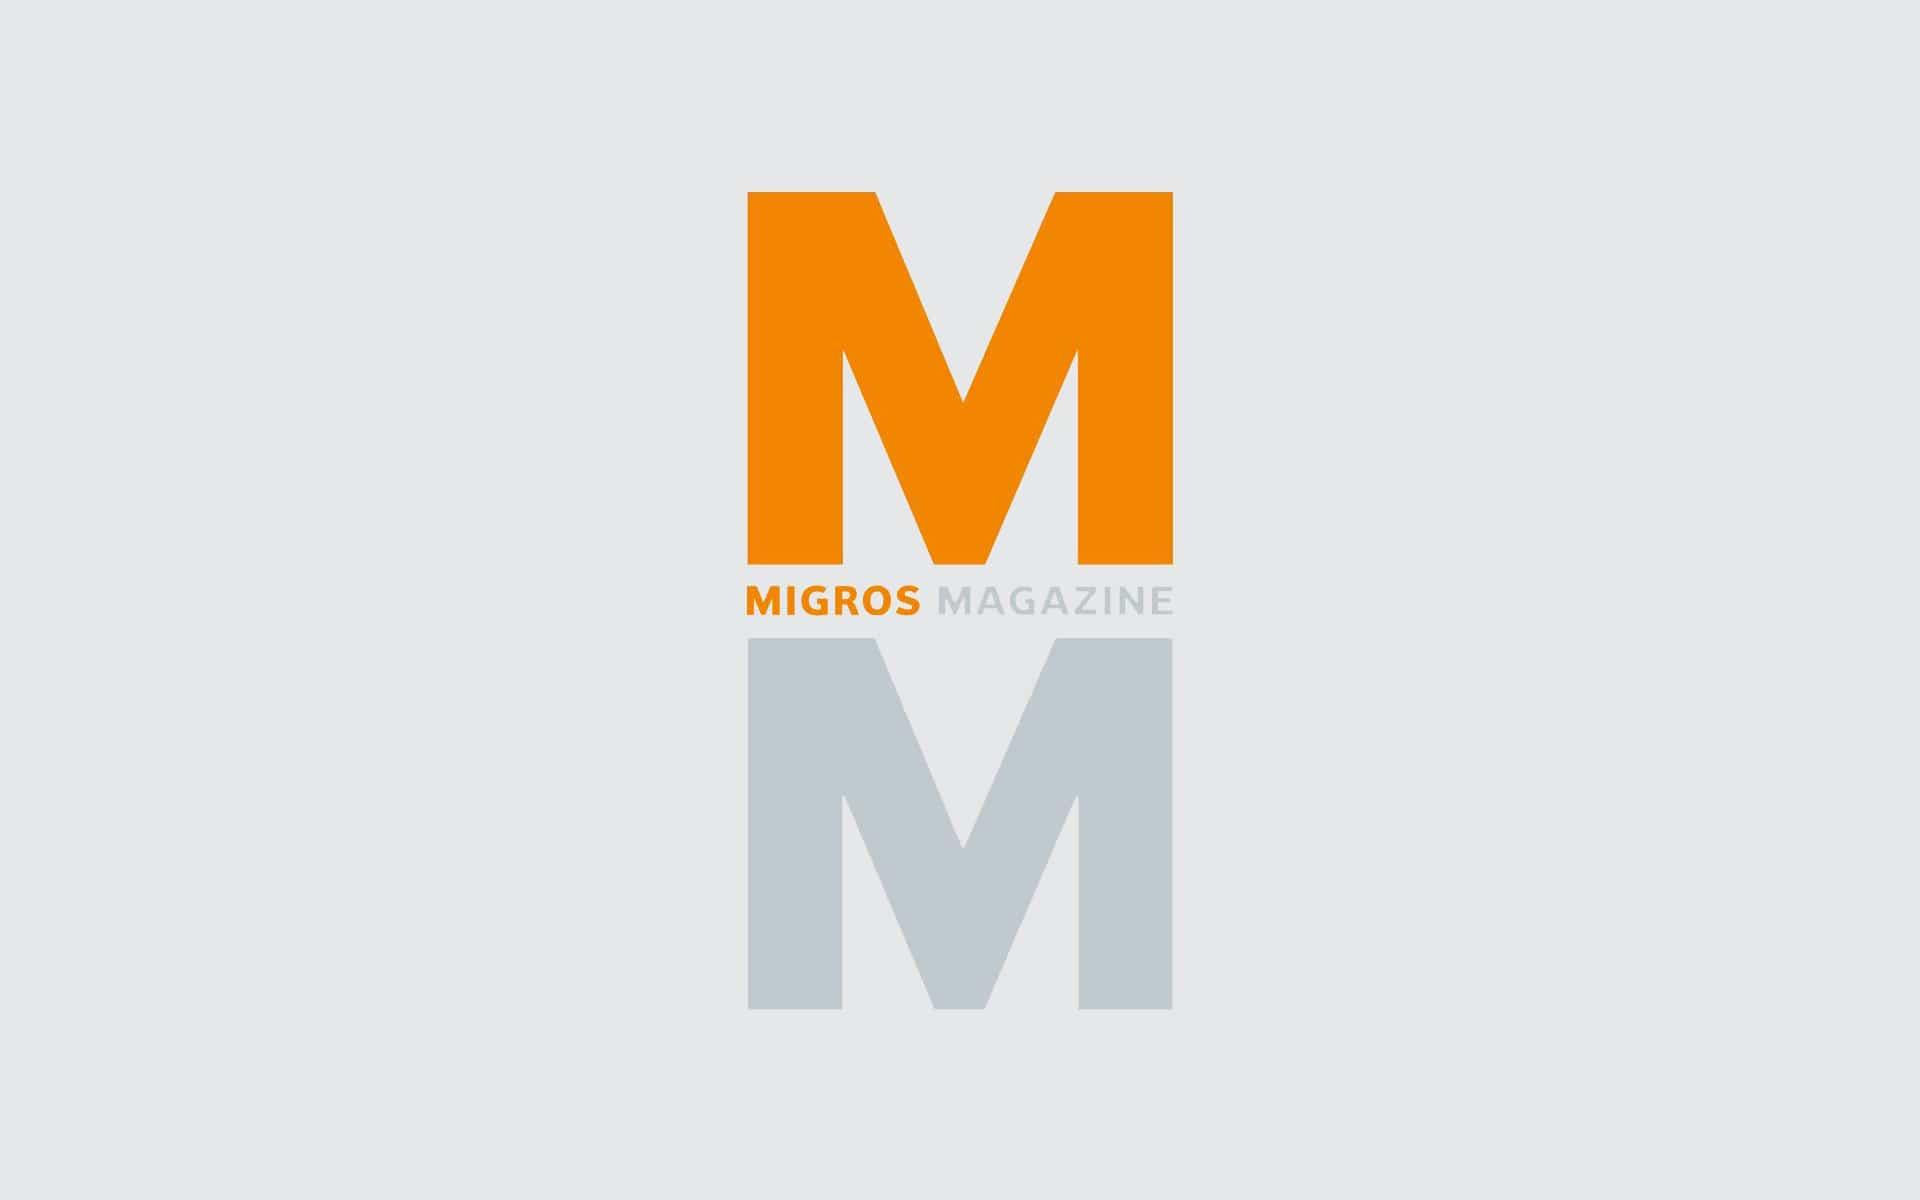 logo migros magazine